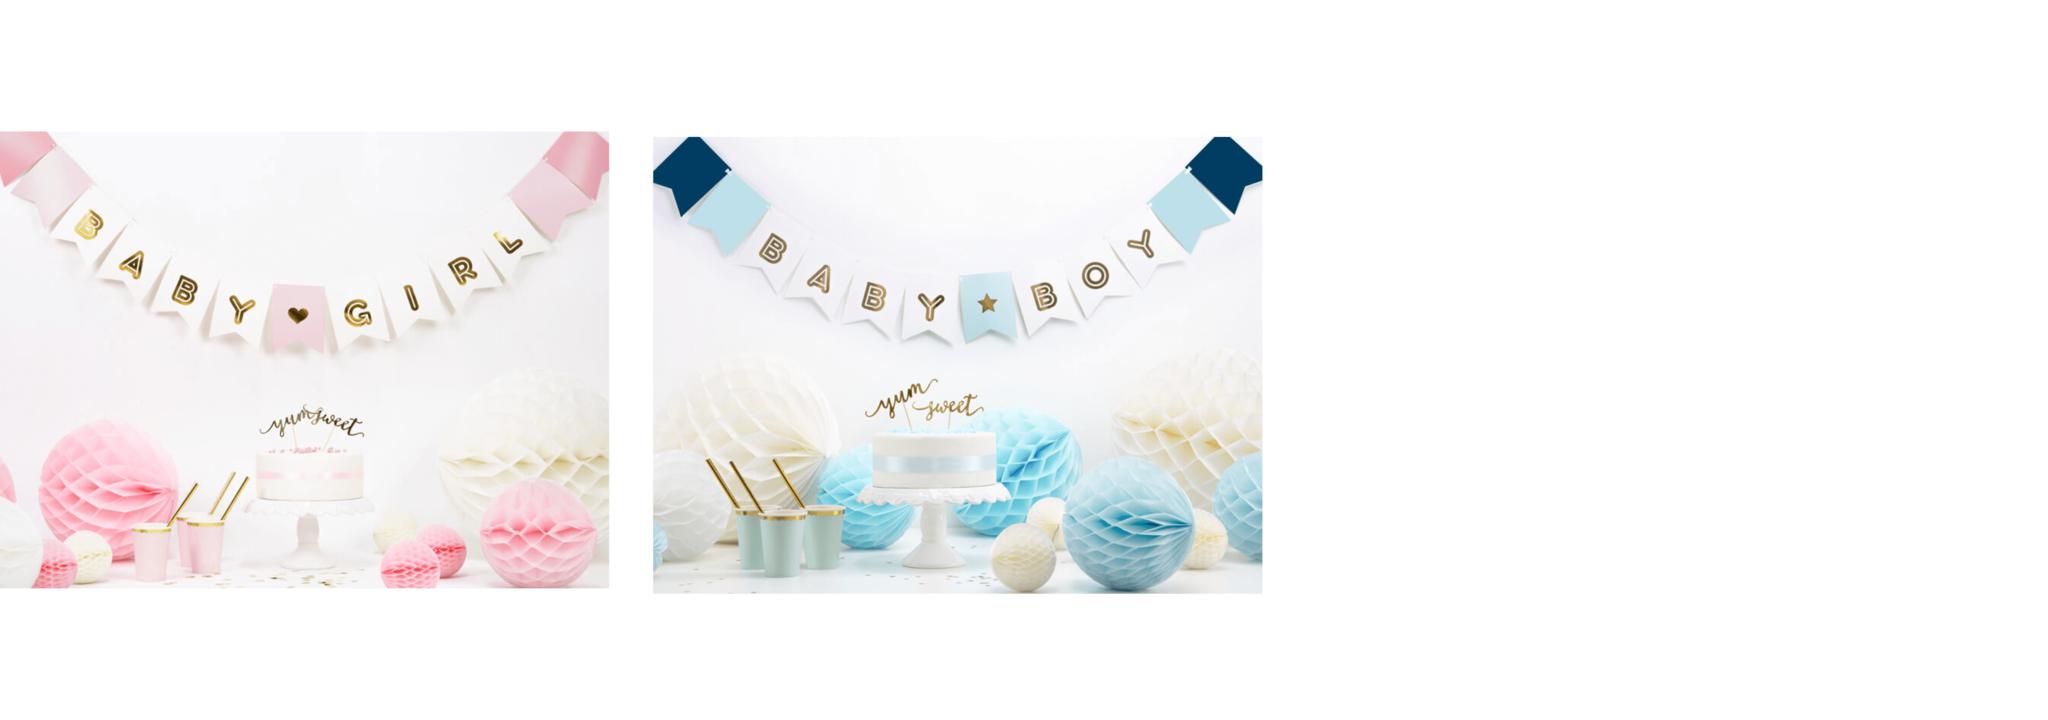 Versiering babyborrel